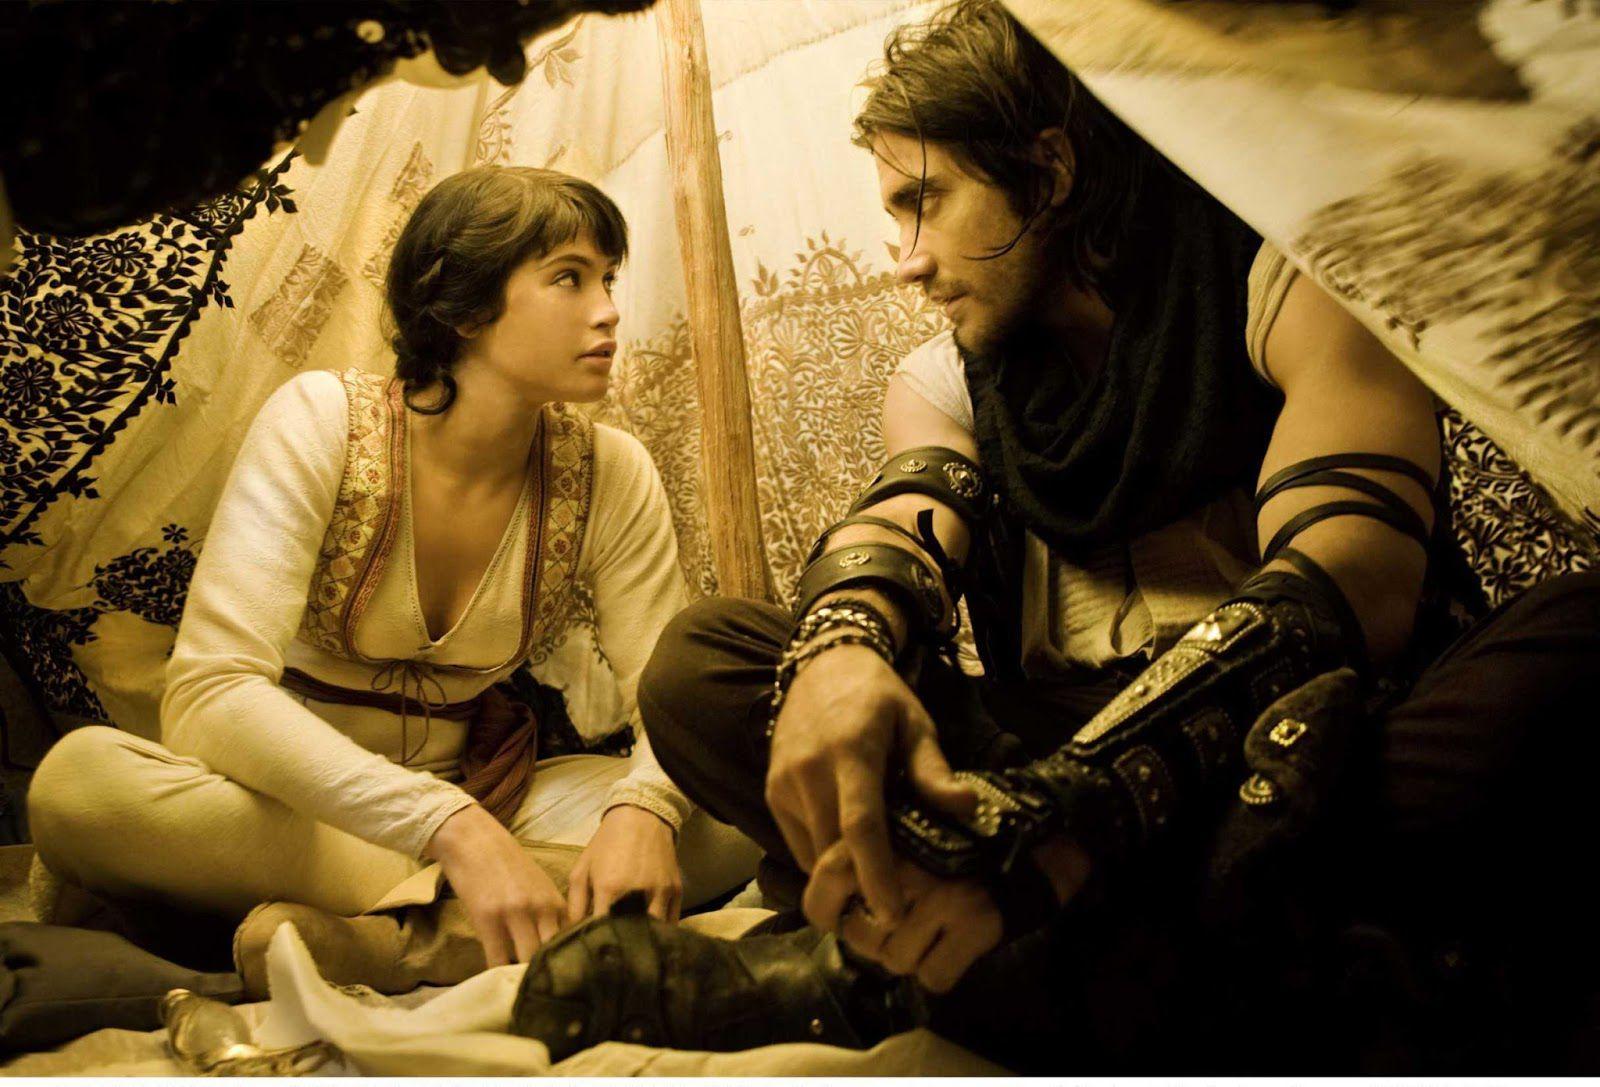 prince of persia film